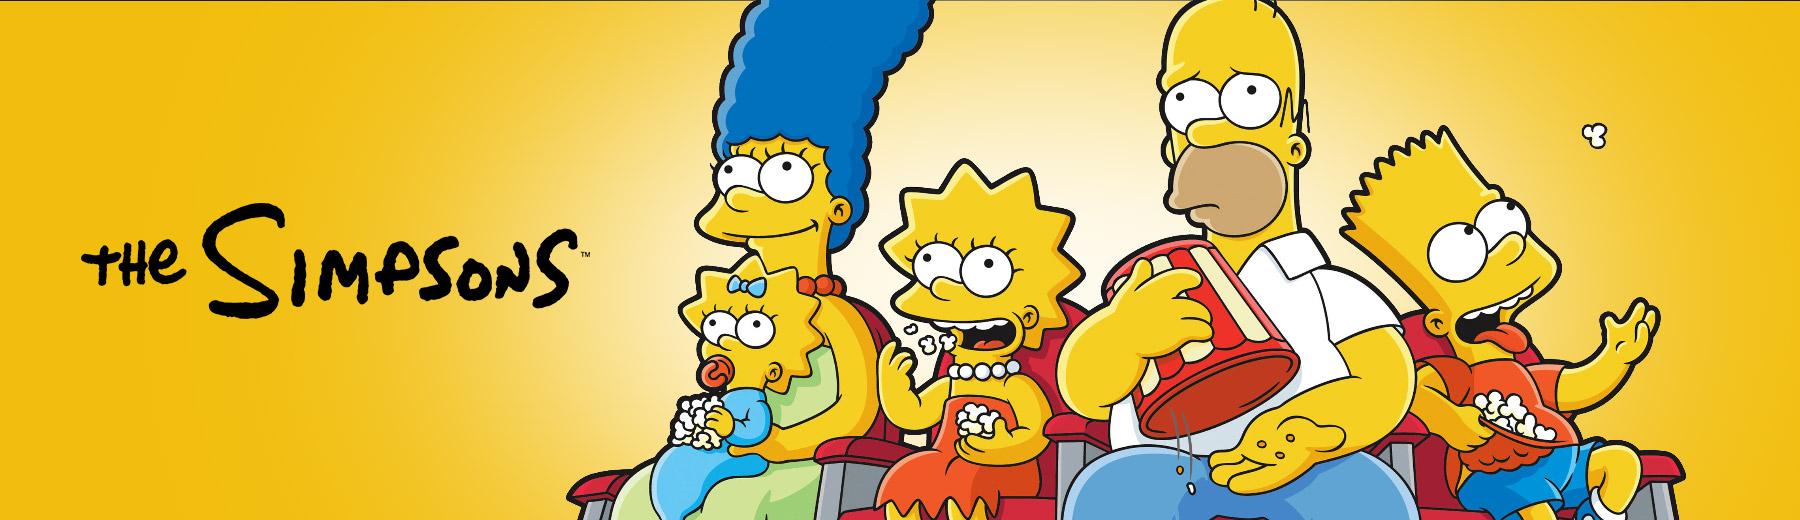 Titanfall Wallpaper Hd The Simpsons Fanartikel Aus Springfield Bei Elbenwald